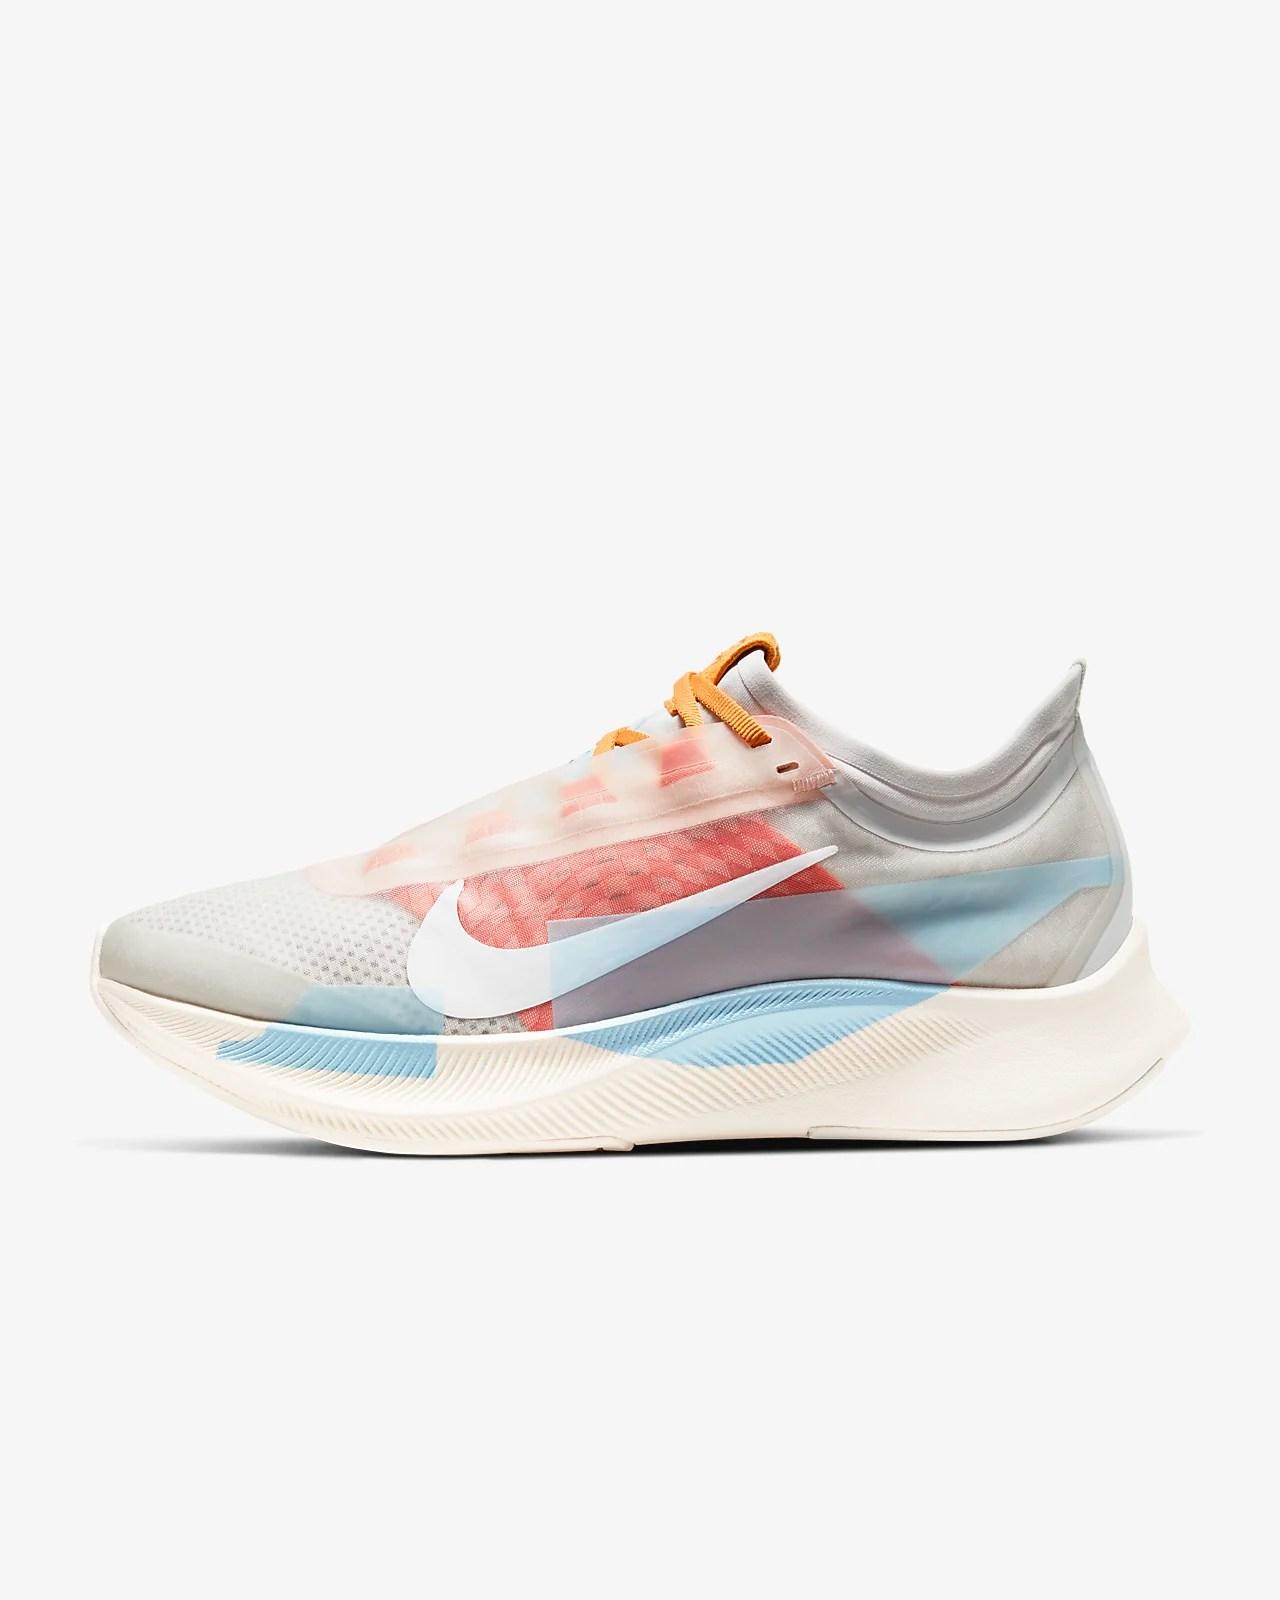 Nike Zoom Fly 3 Premium 女款跑鞋. Nike TW